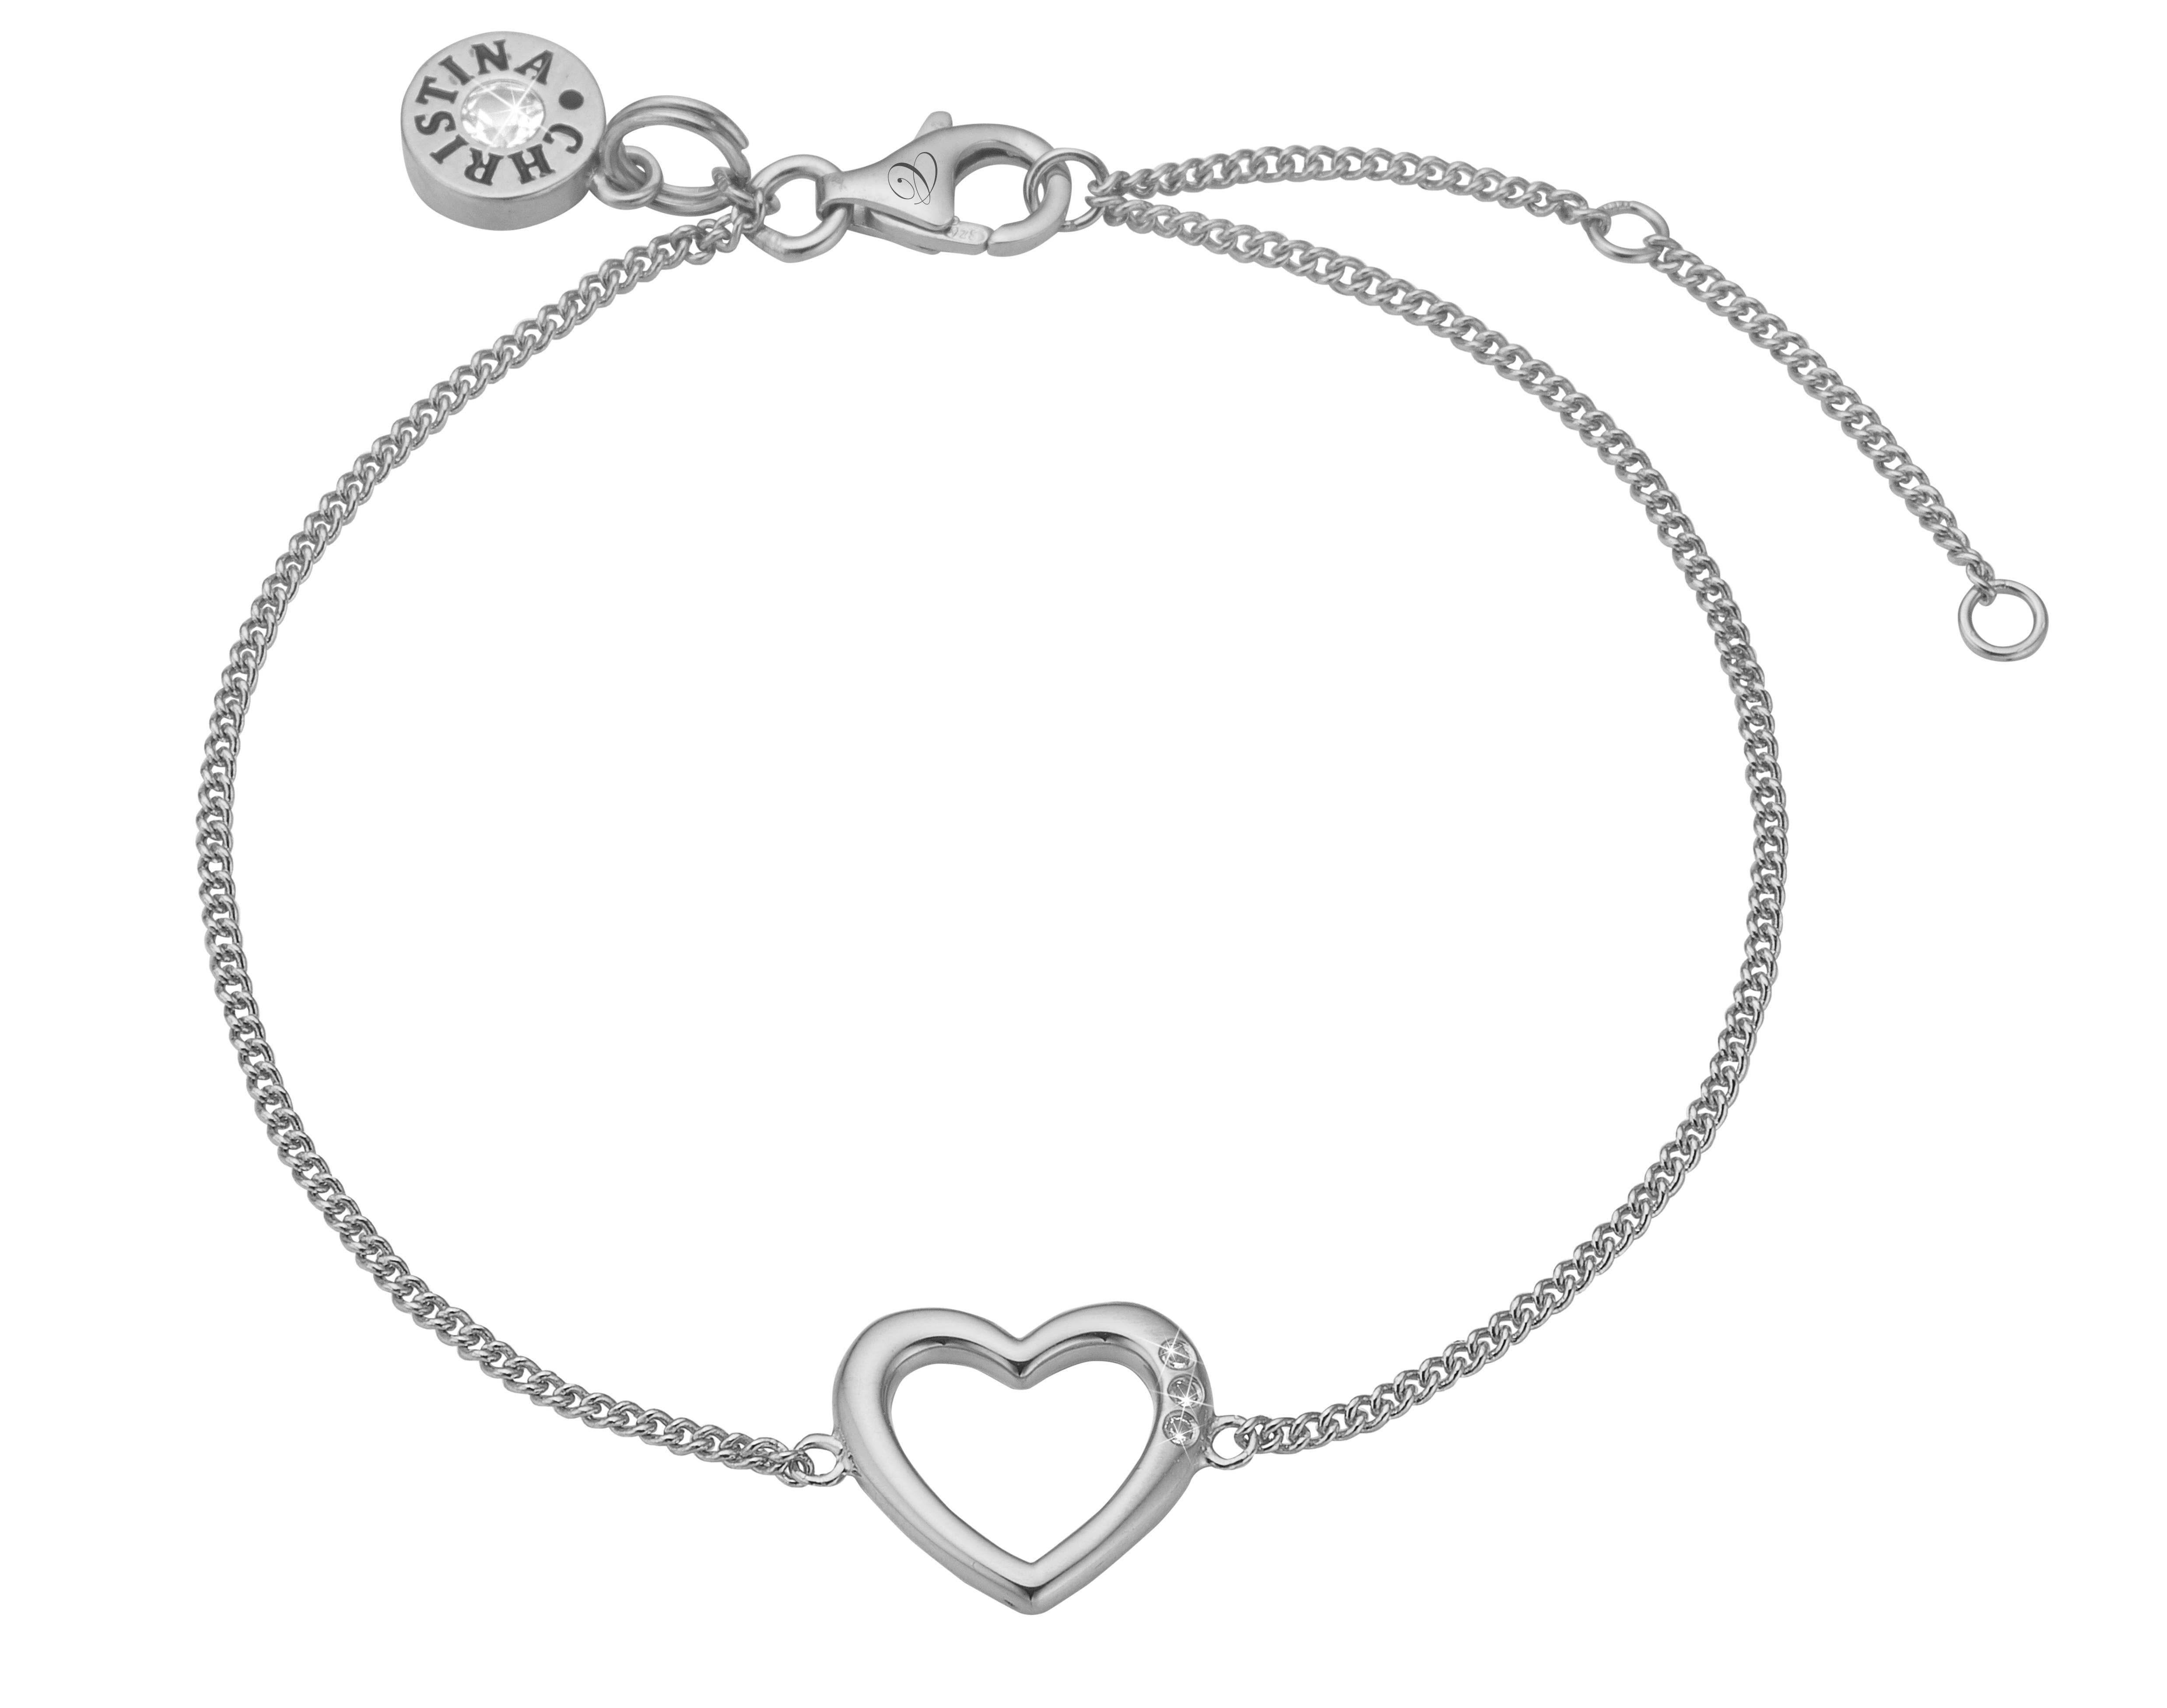 Image of Christina open heart sølvarmbånd - 601-S10 20 centimeter